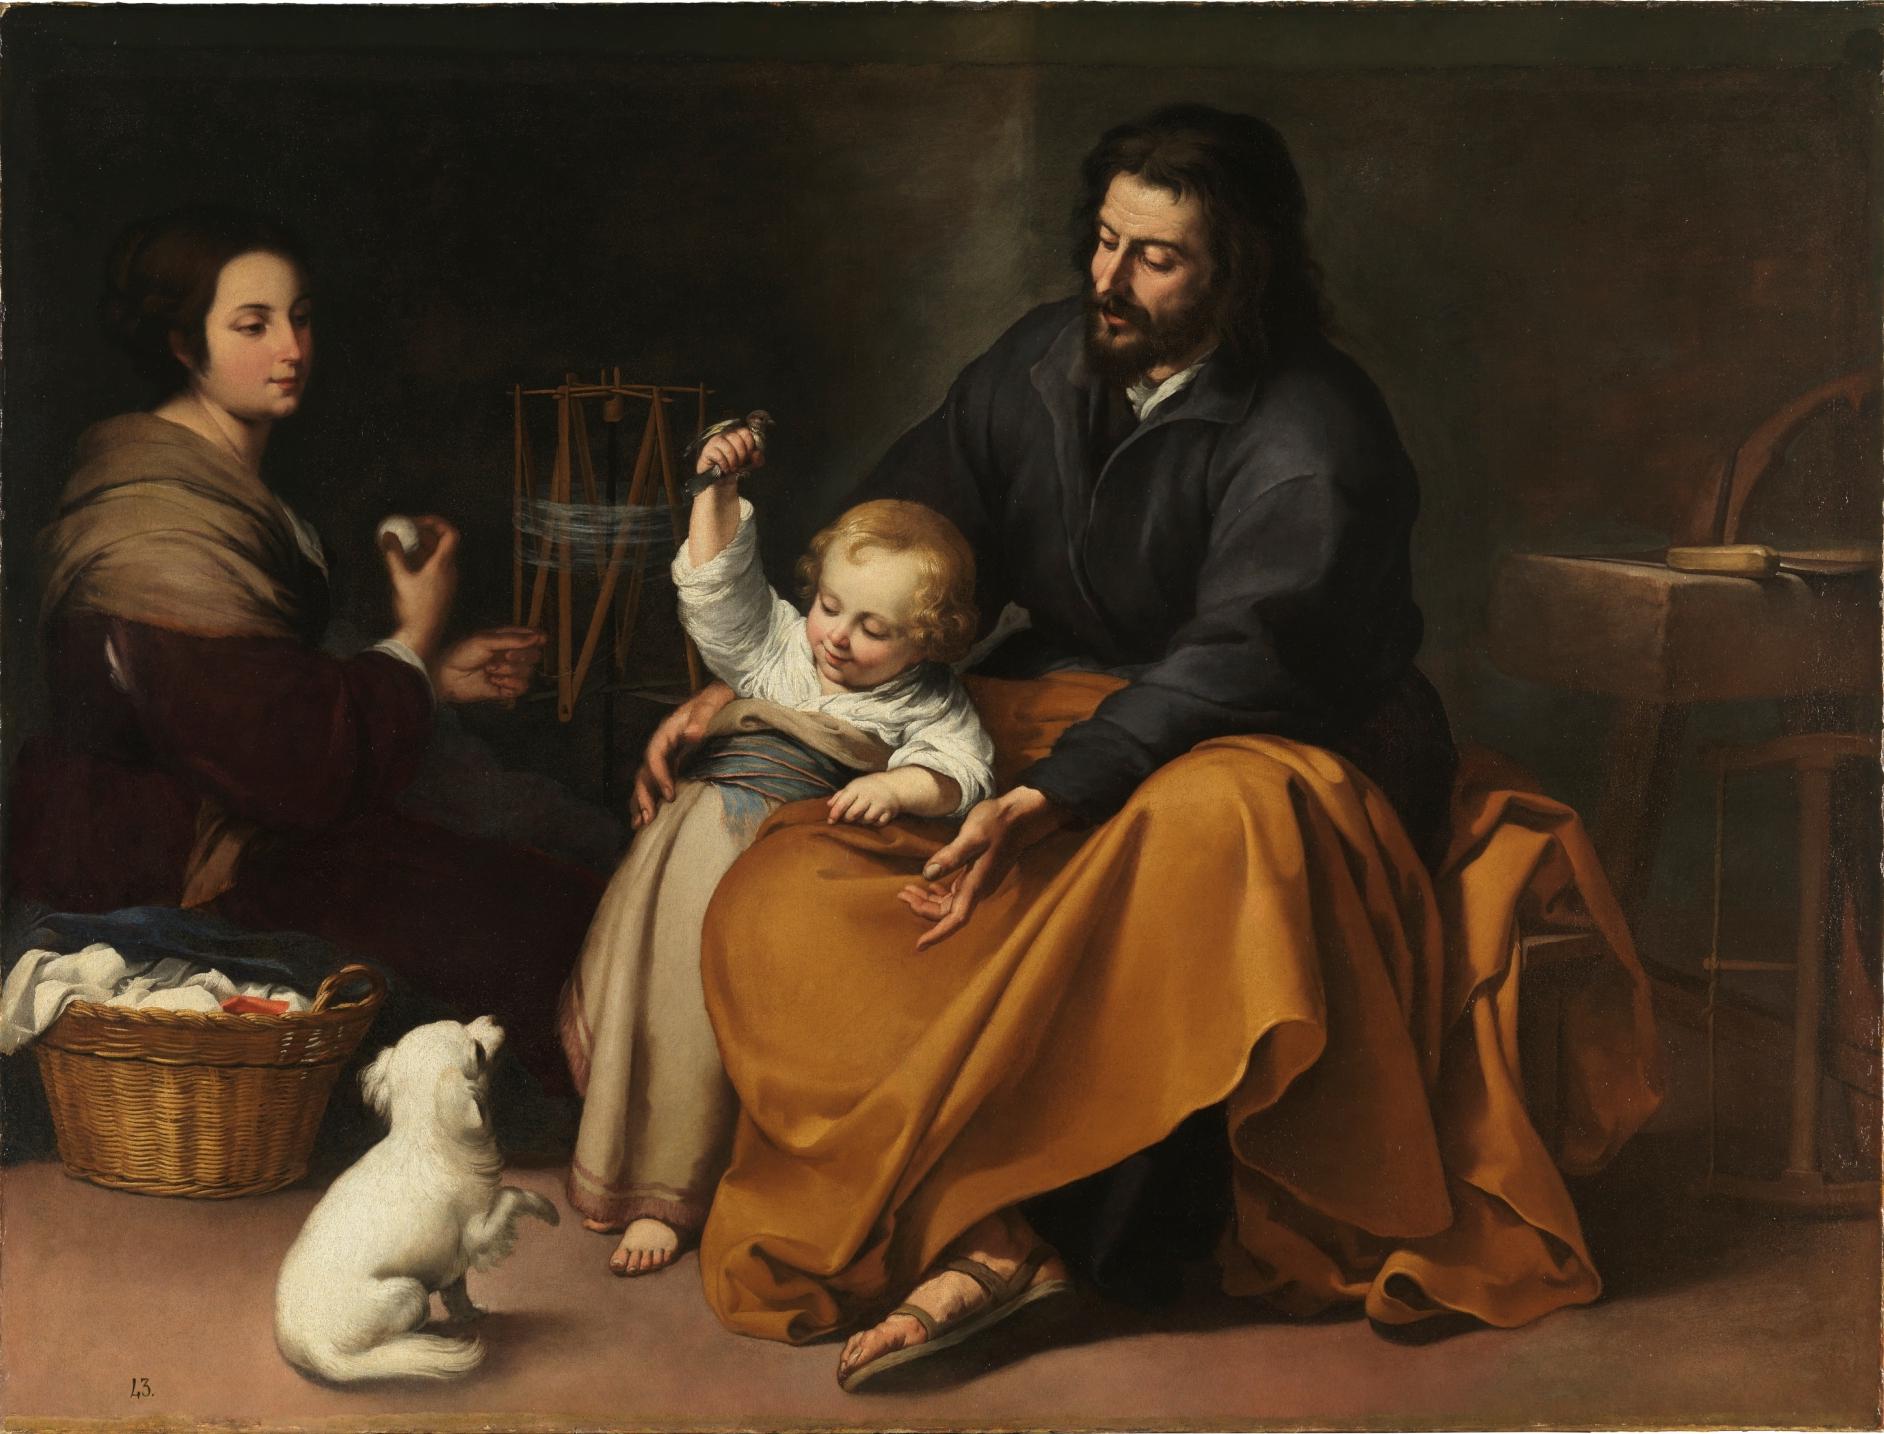 Holy Family with Bird, by Bartolomé Esteban Murillo, c. 1650. Museo del Prado, Madrid, Spain. Via IllustratedPrayer.com